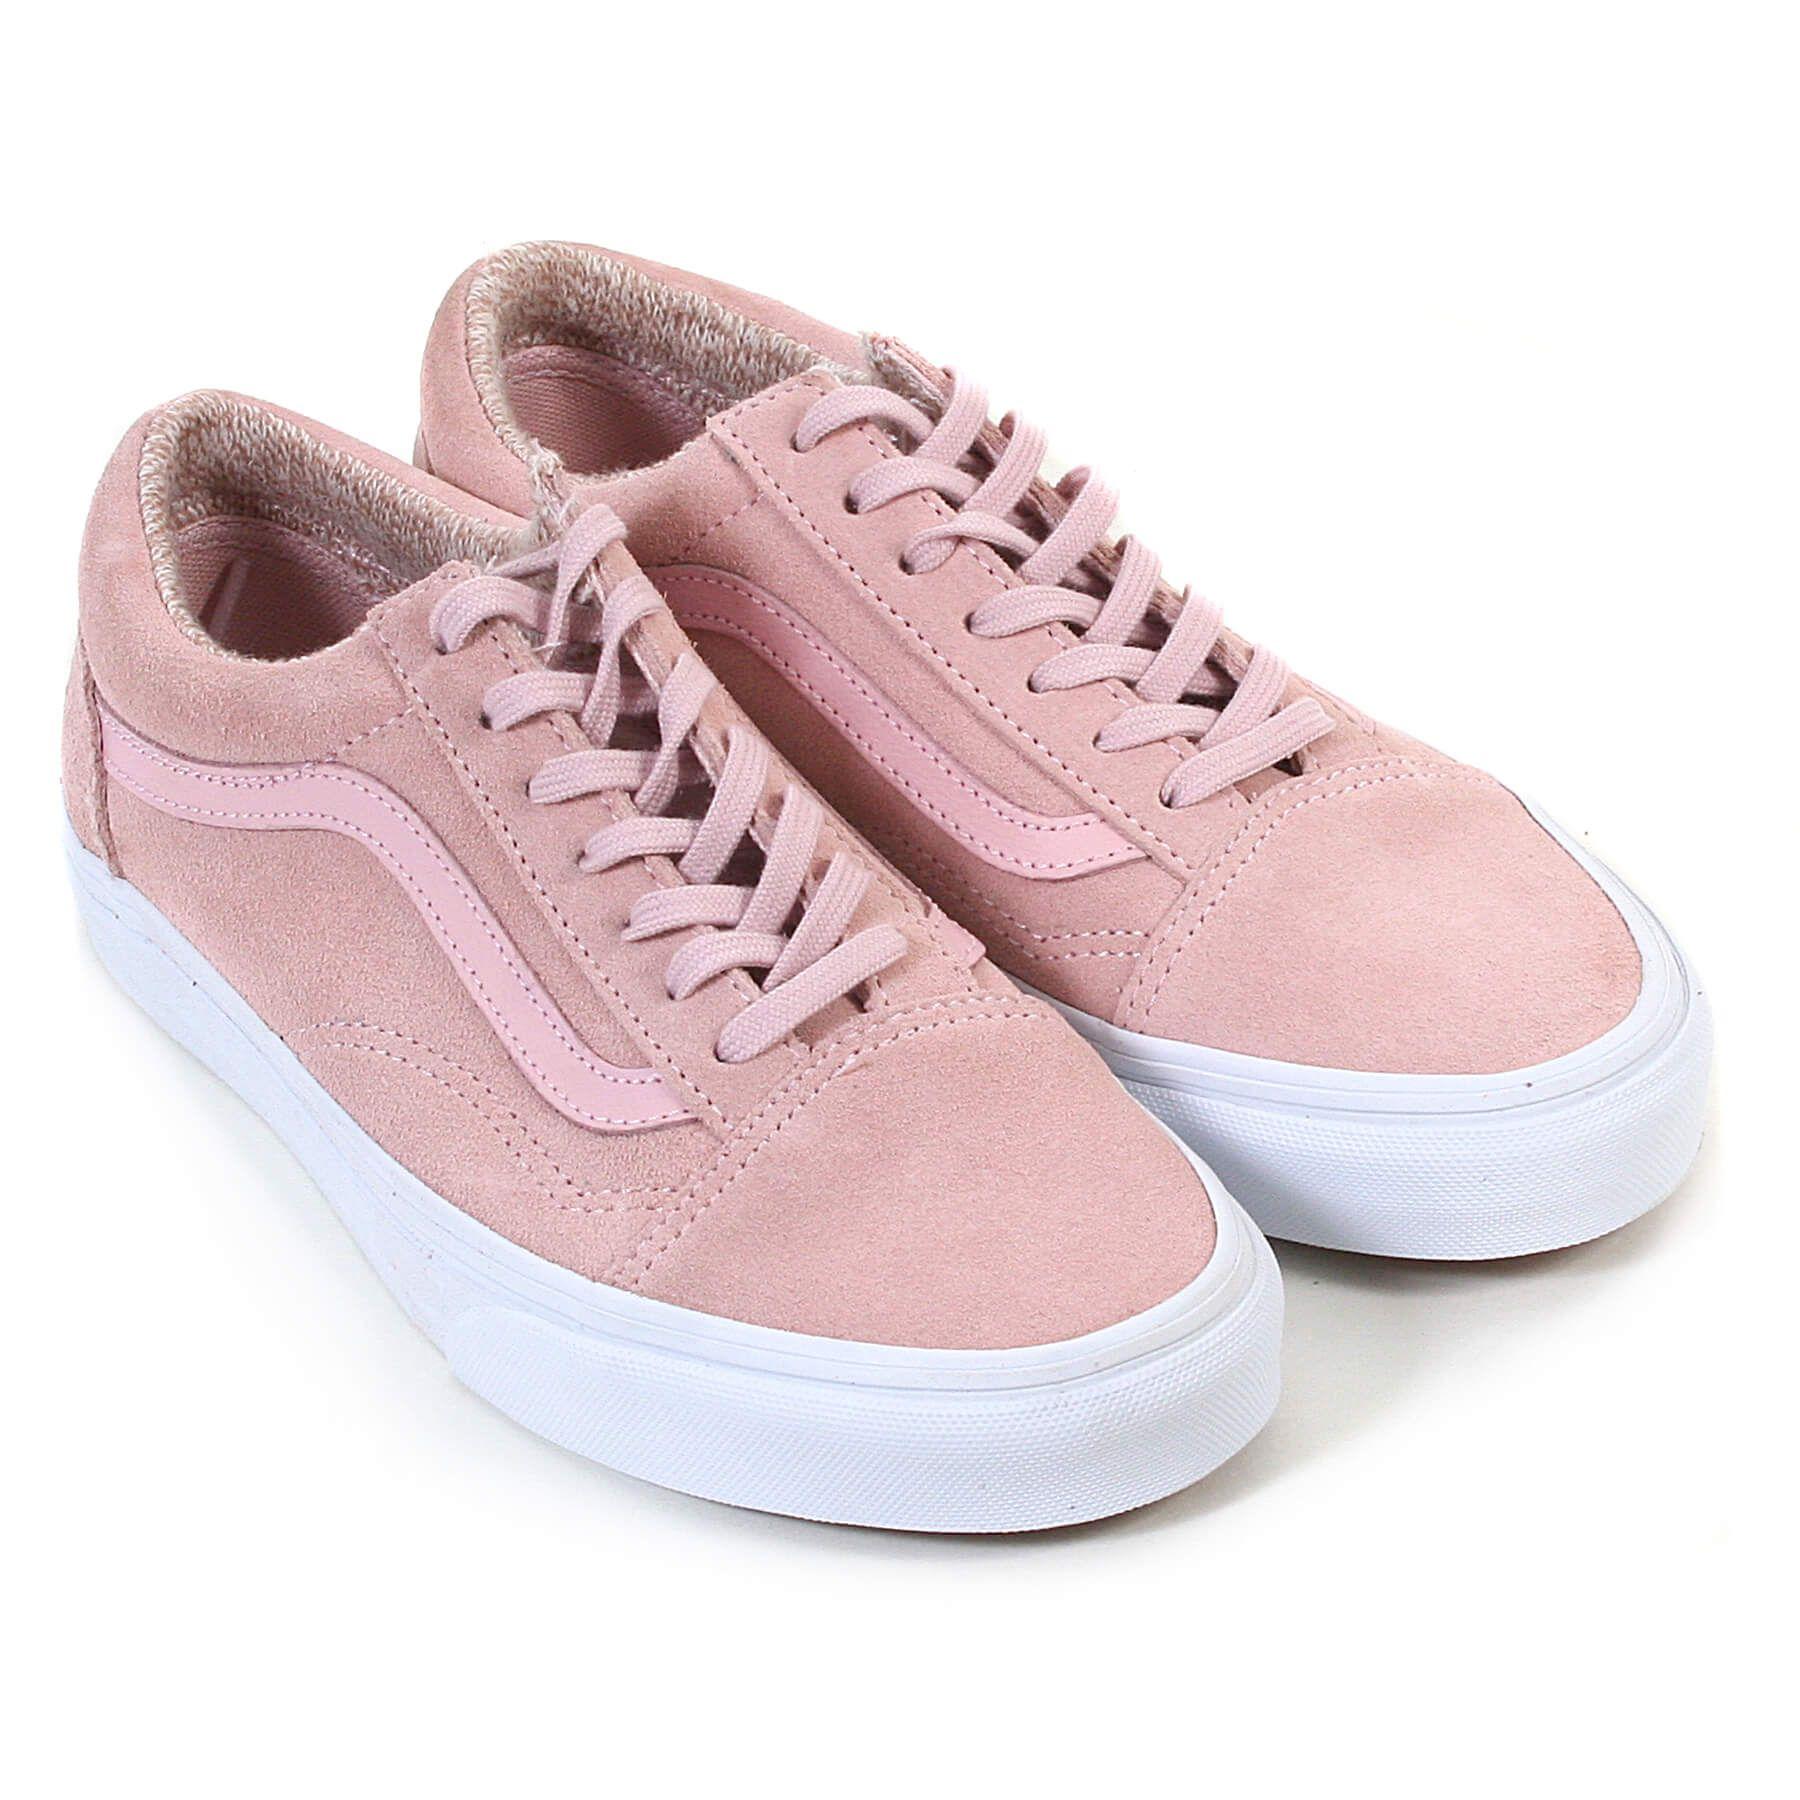 vans old skool pink suede shoes sneakers pinterest. Black Bedroom Furniture Sets. Home Design Ideas